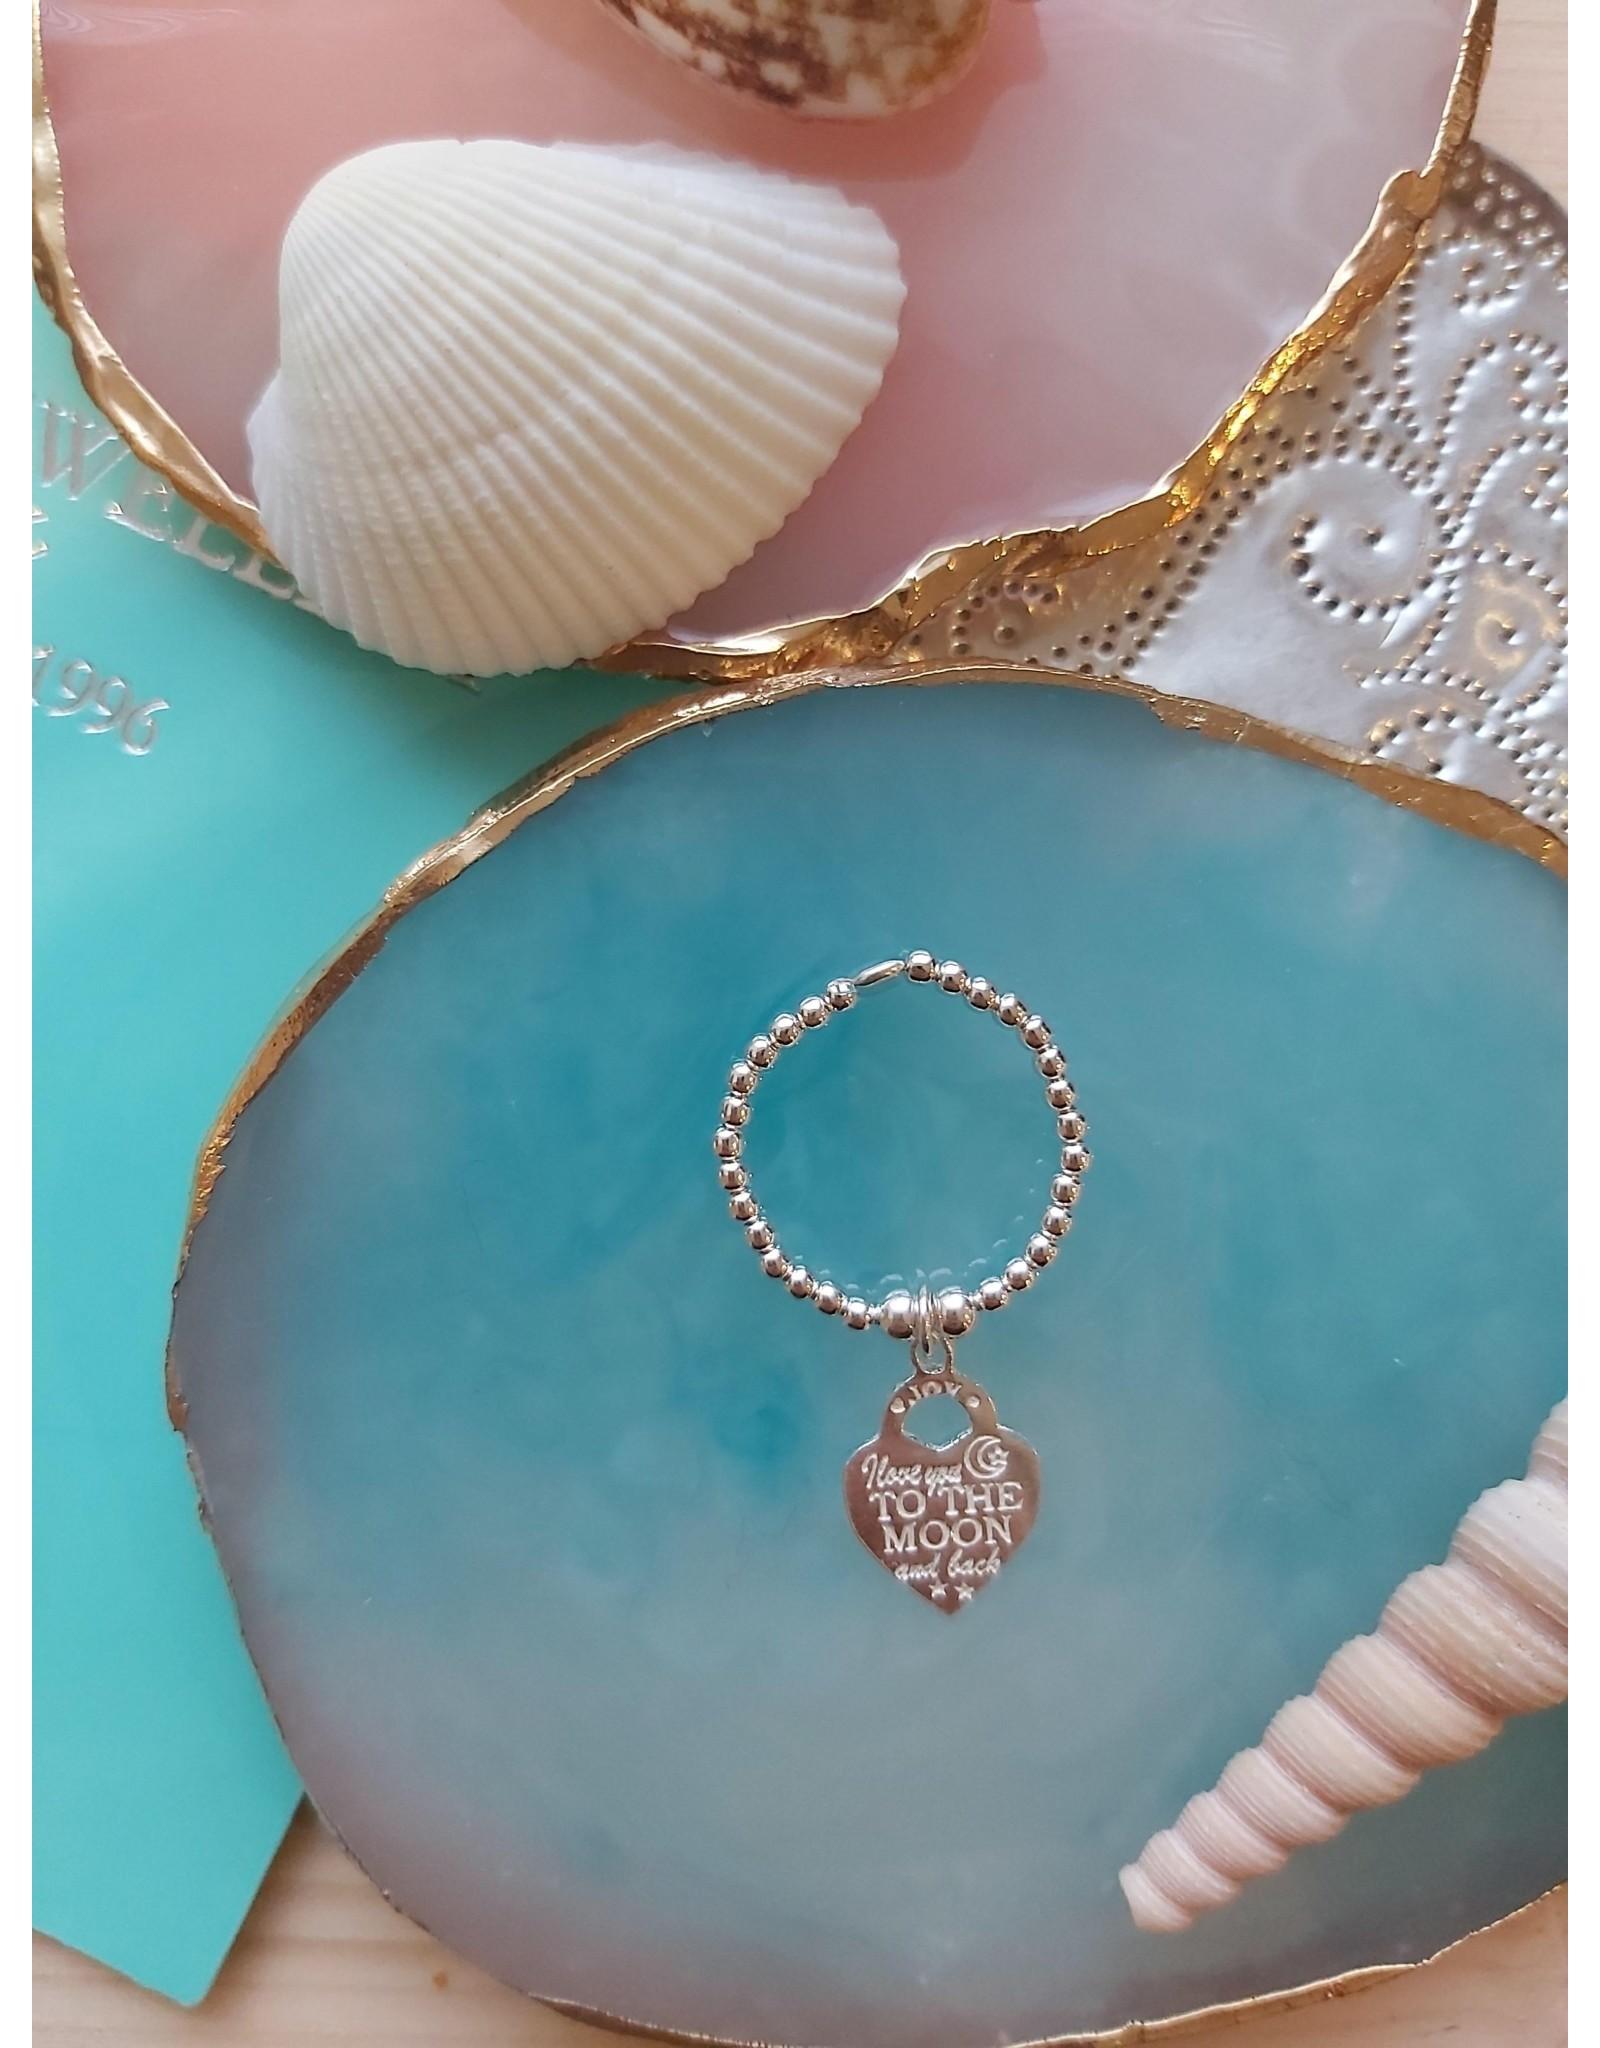 Joy Bali JOY Cenik ring - To The Moon